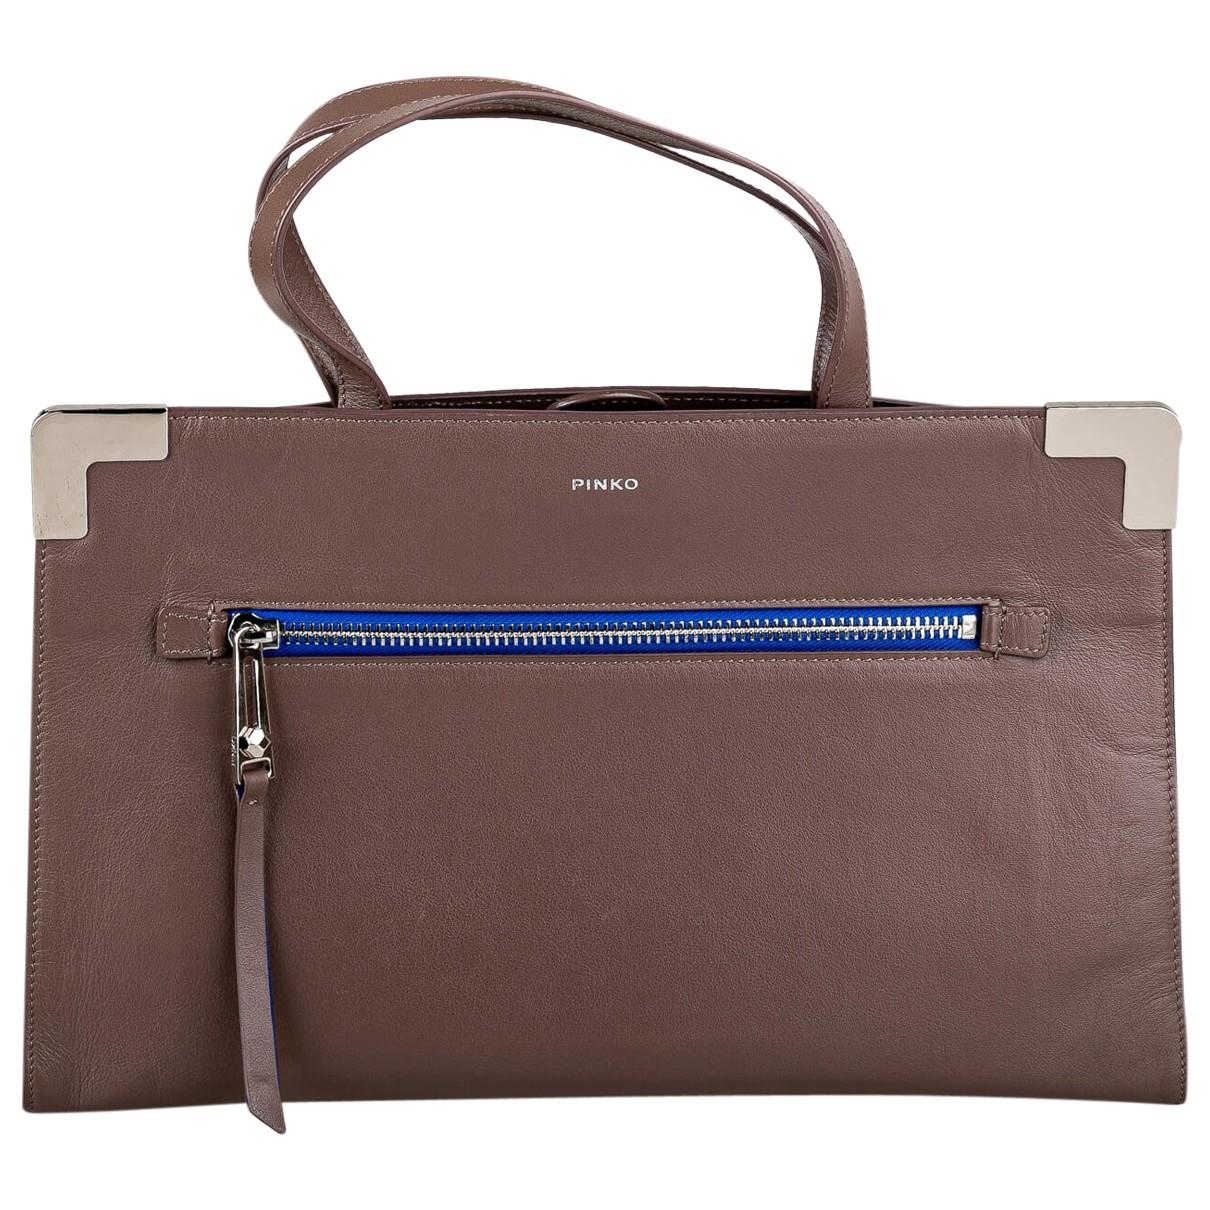 Pinko \N Brown Leather handbag for Women \N